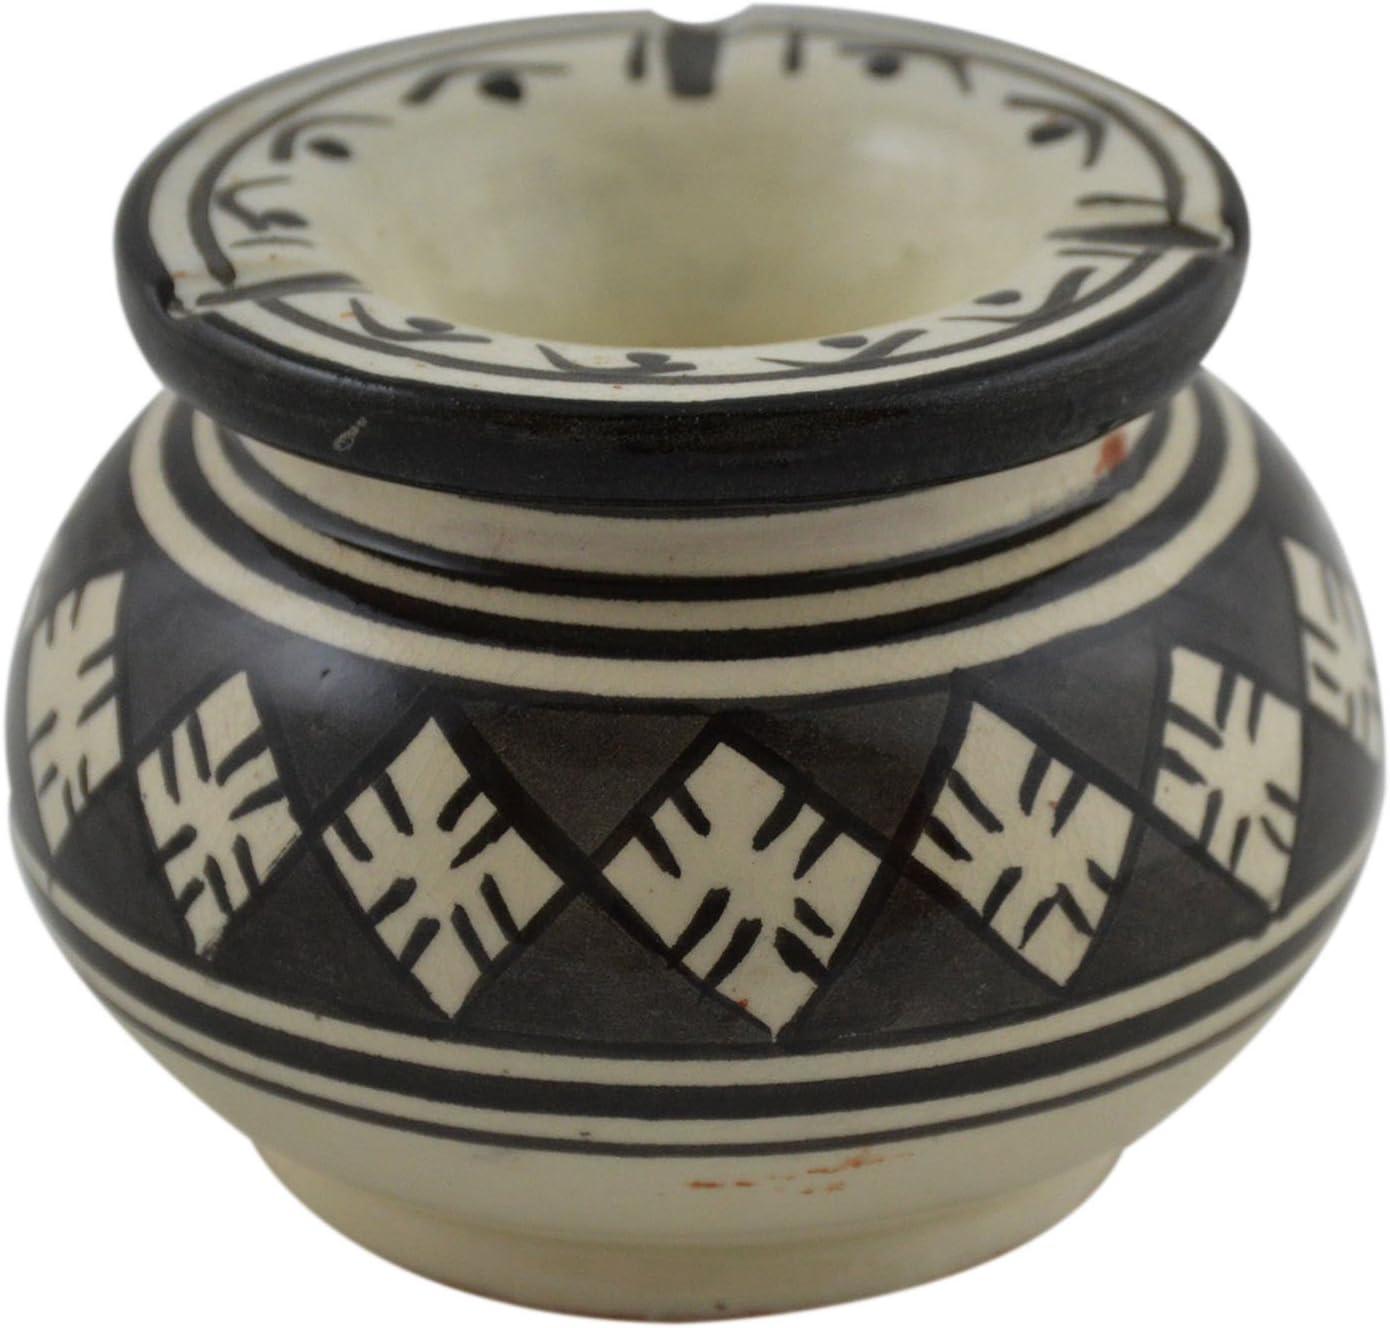 Ceramic Ashtrays Max 43% OFF Hand Made Smokeless Max 87% OFF bla Moroccan Medium